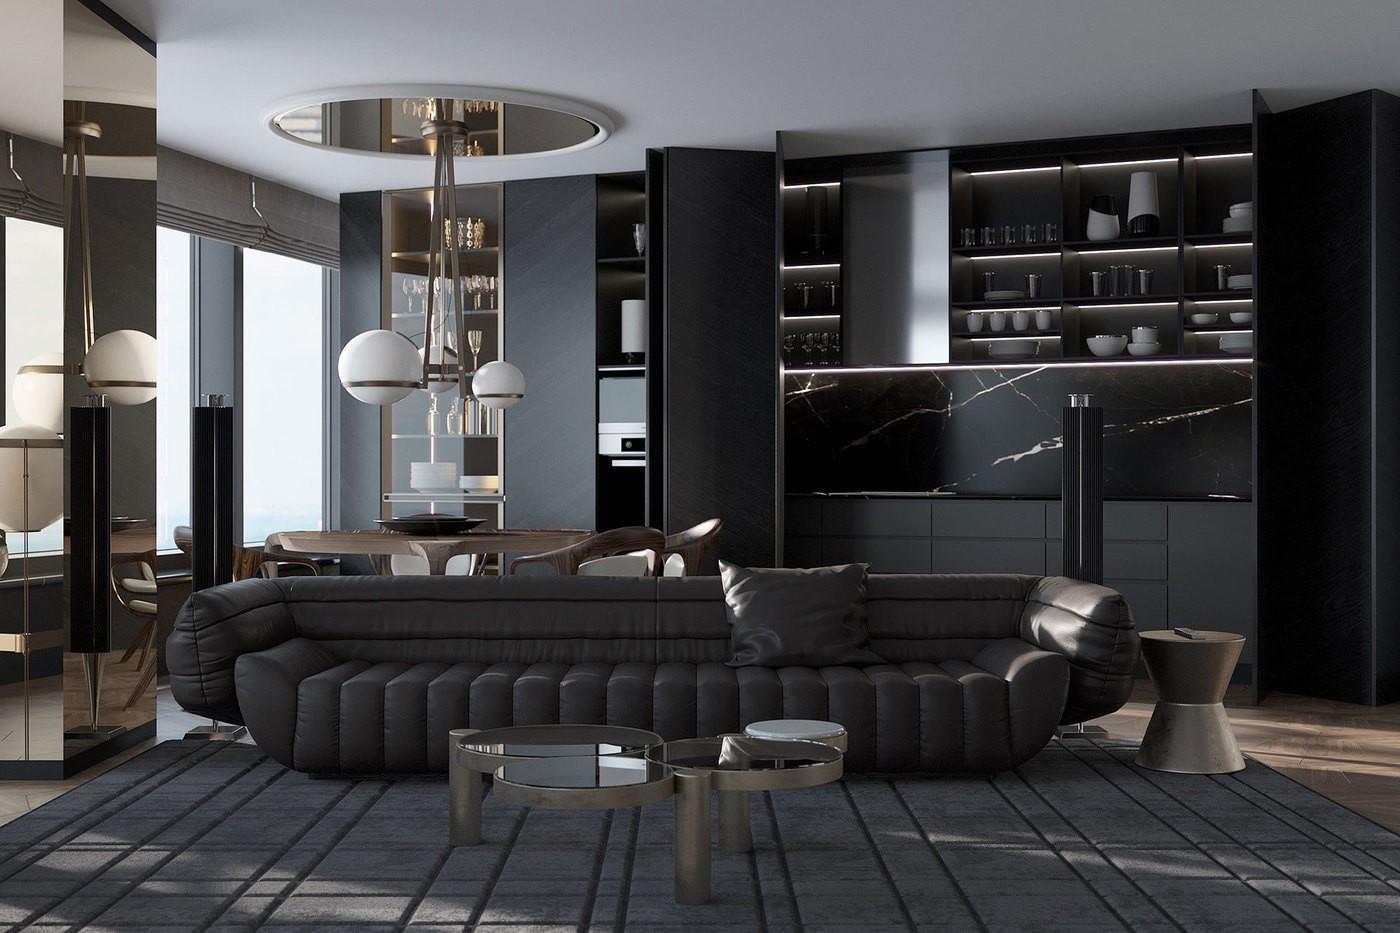 Ekaterina Elizarova designed this stylish modern interior